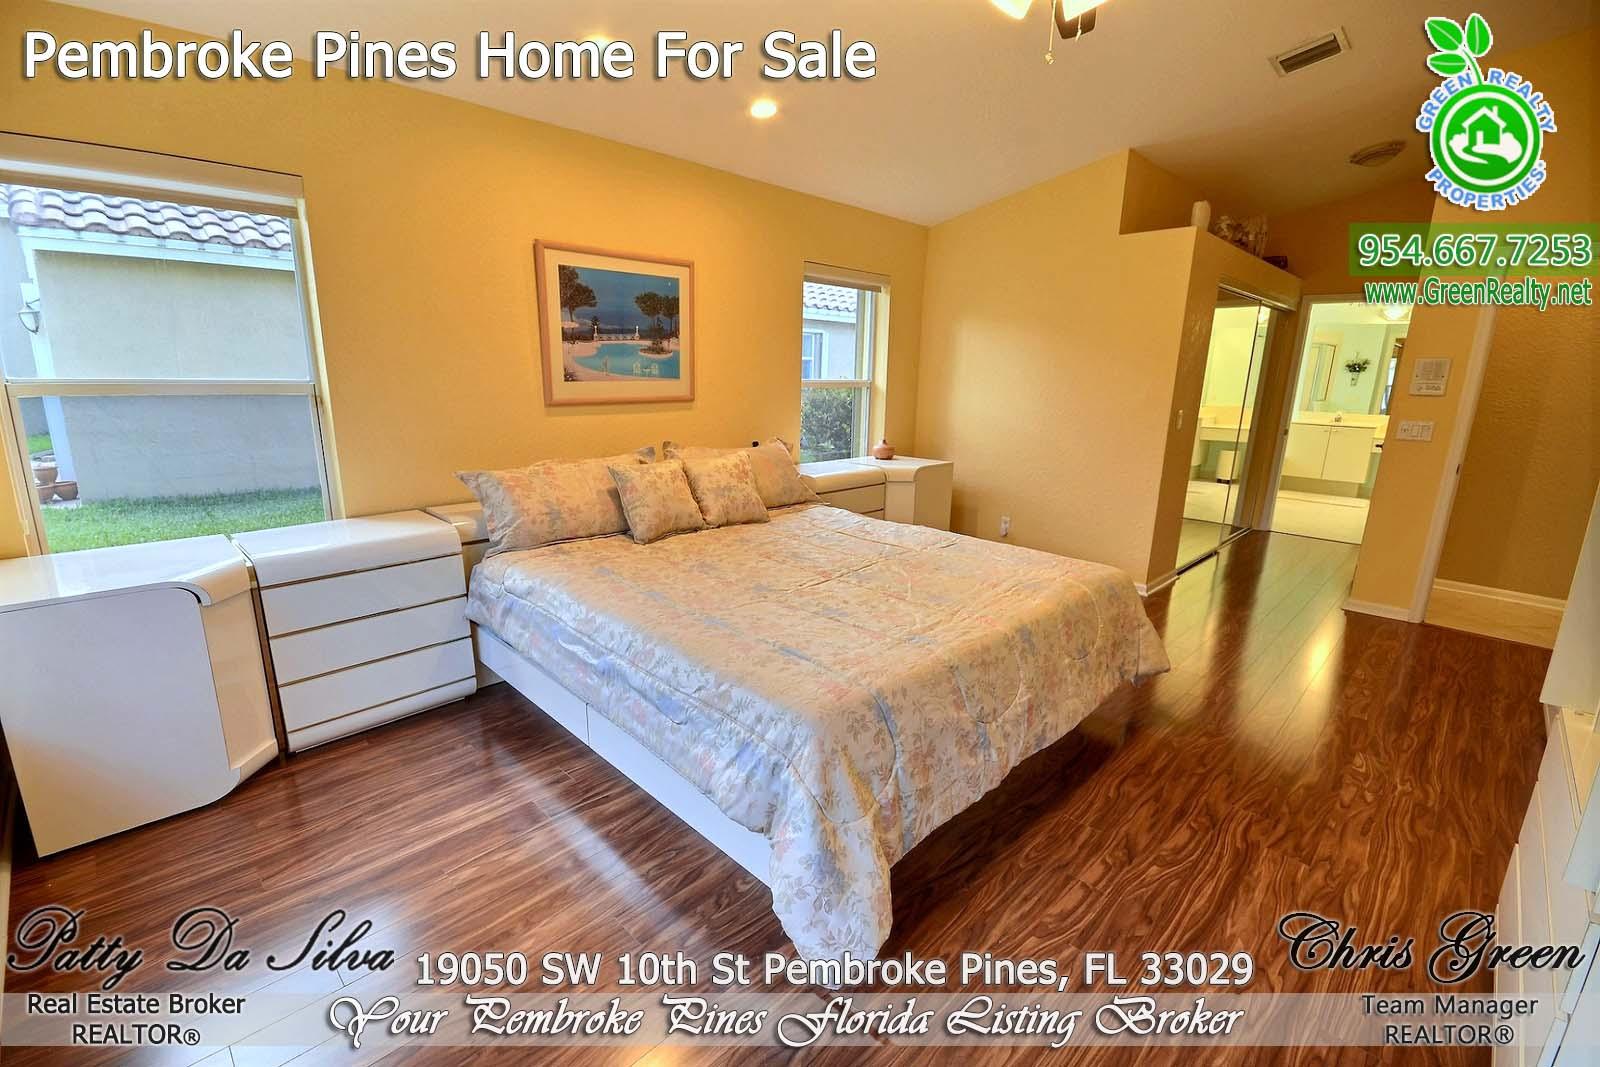 20 Pembroke Pines Real Estate (5)